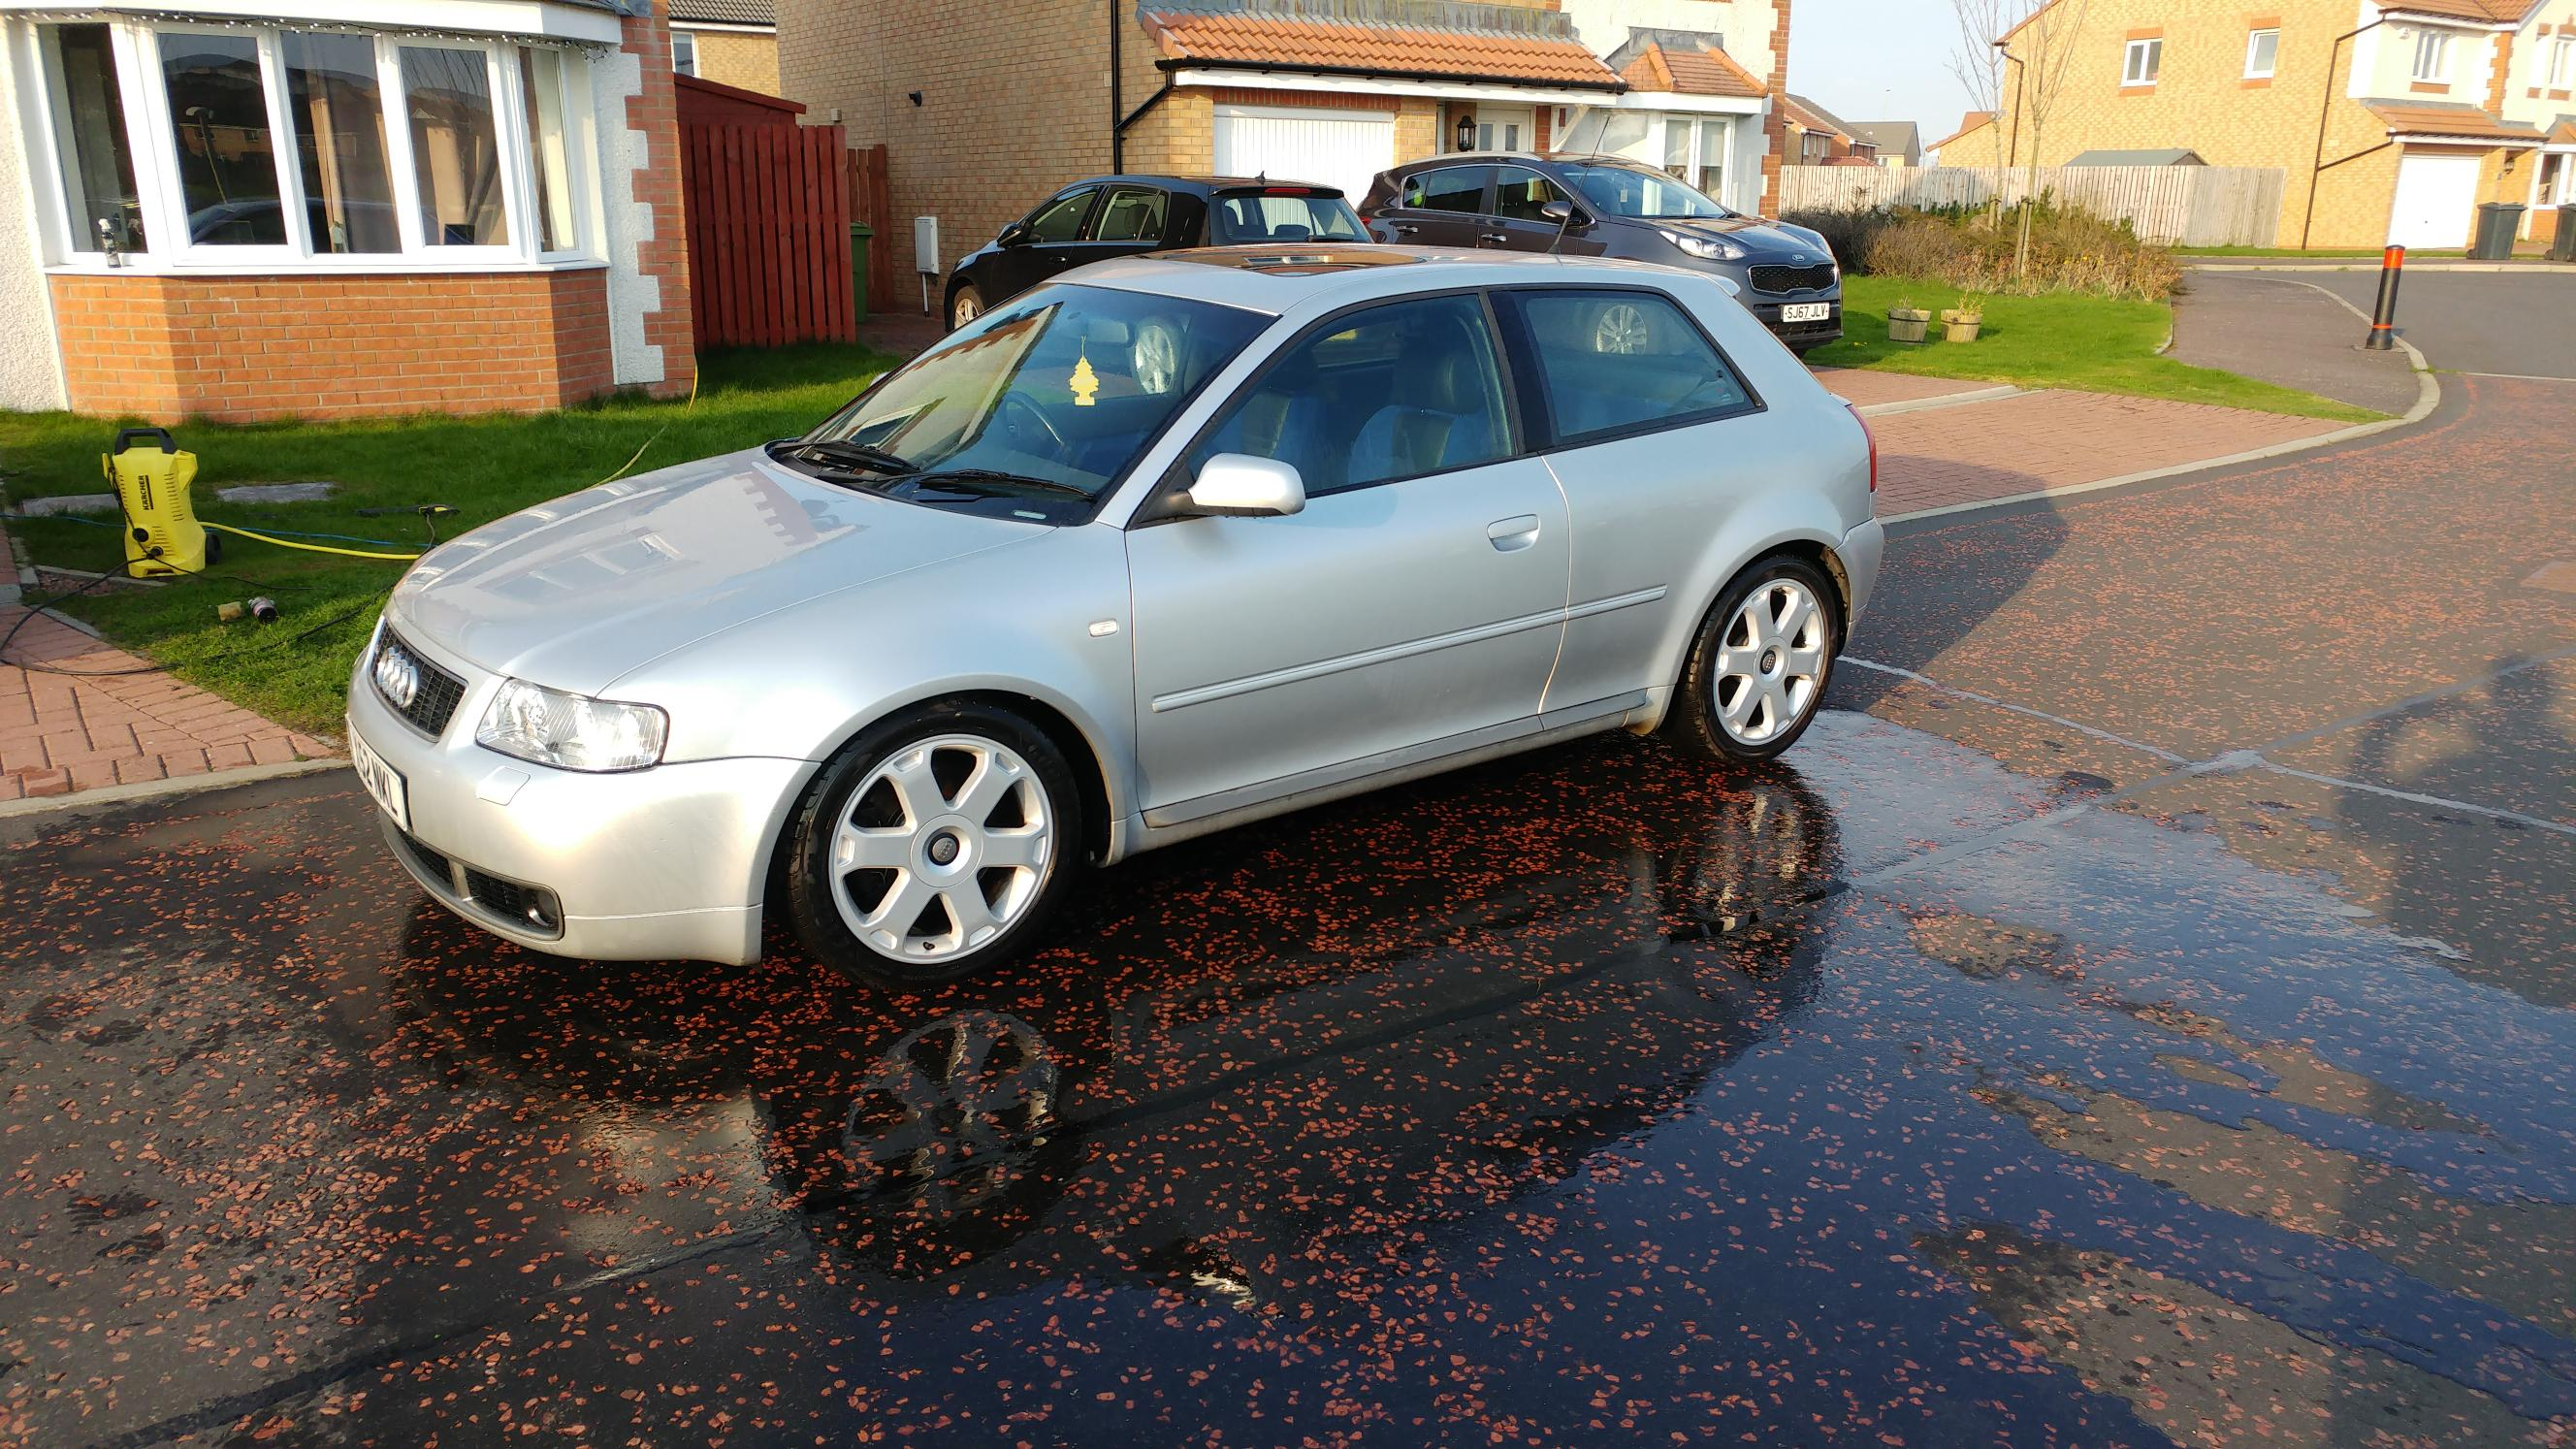 Kelebihan Kekurangan Audi S3 2001 Murah Berkualitas